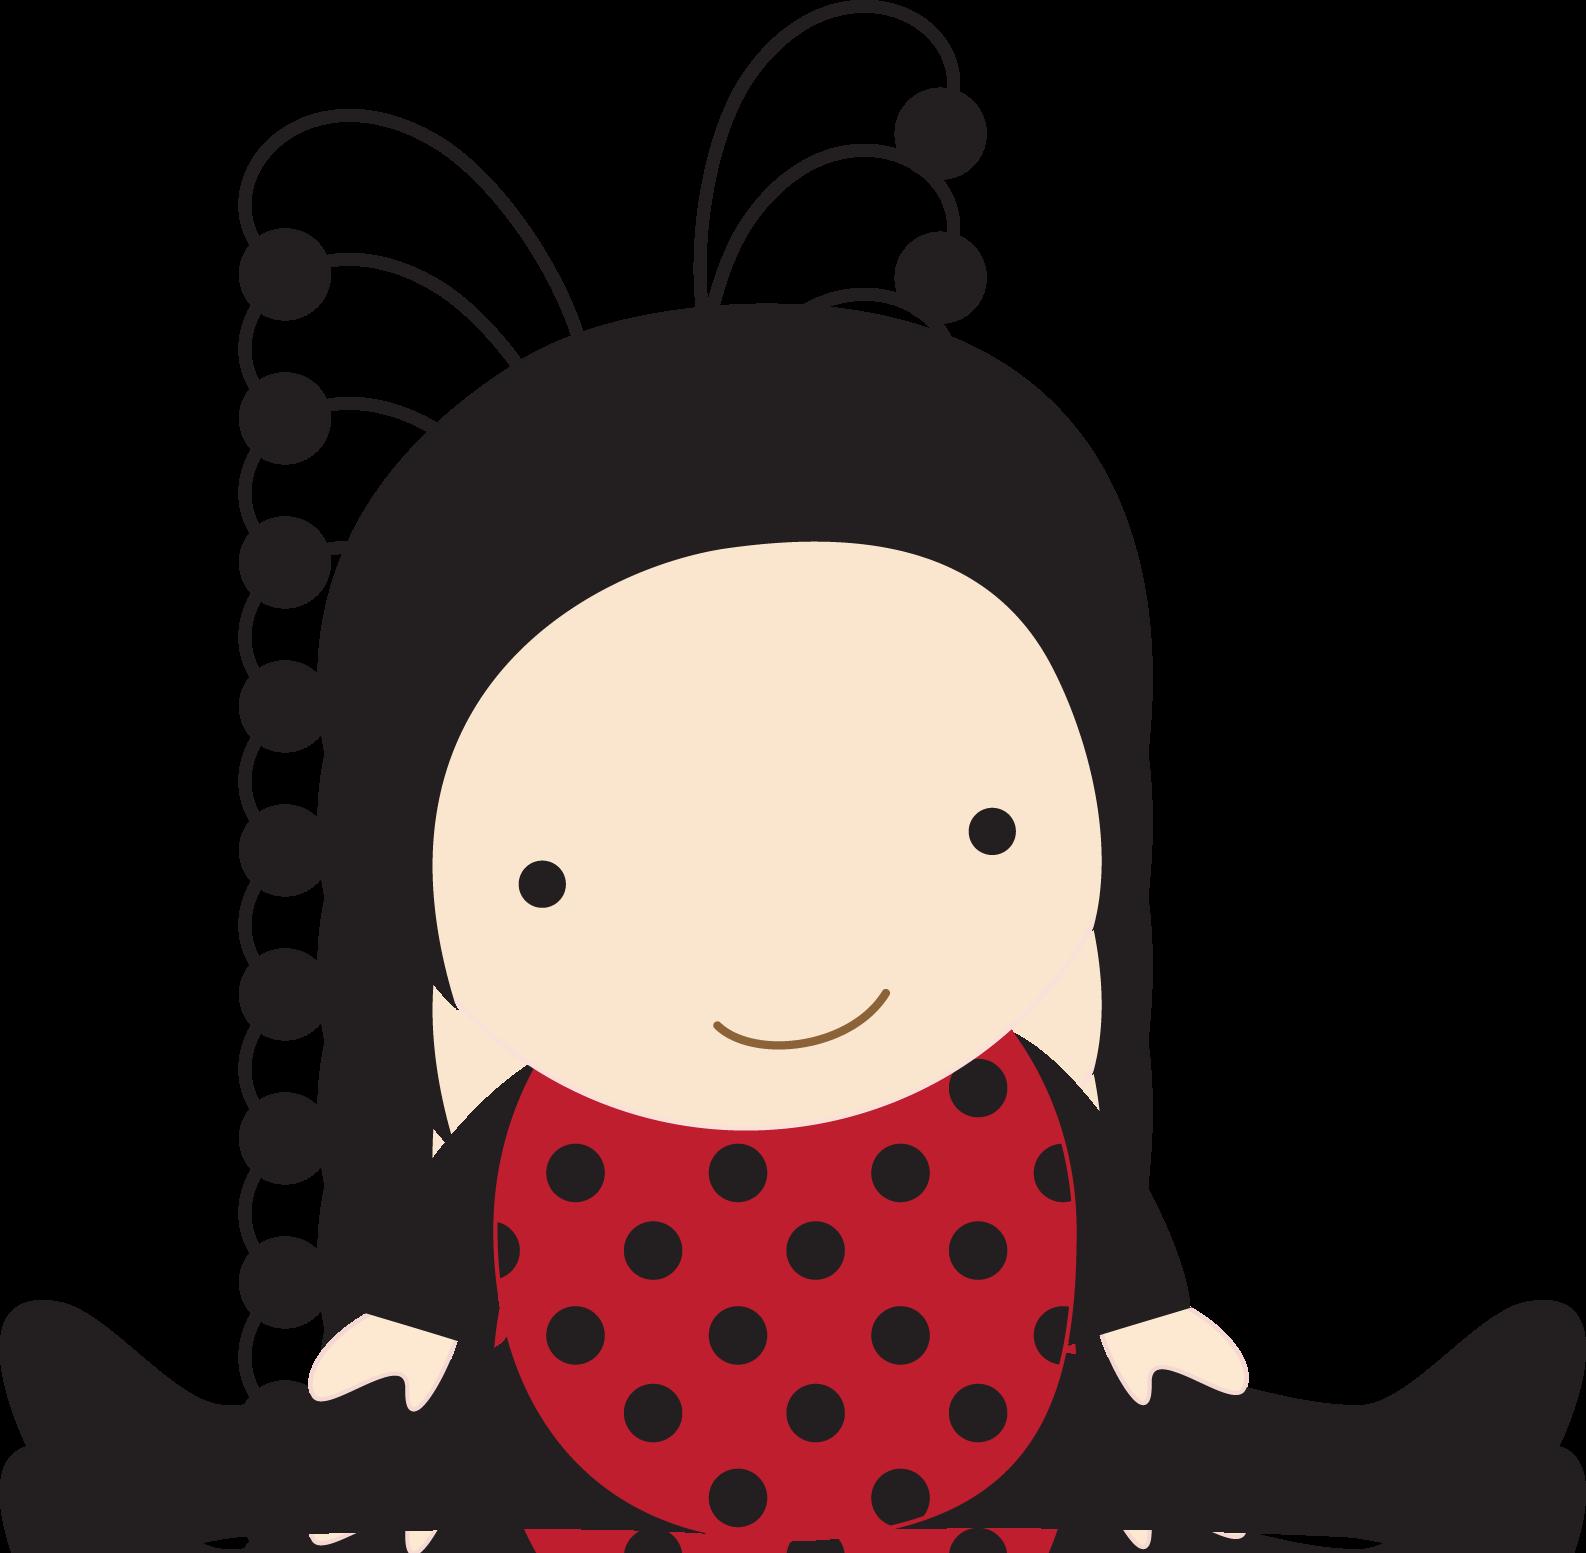 Ladybugs clipart baby shower.  collection of ladybug